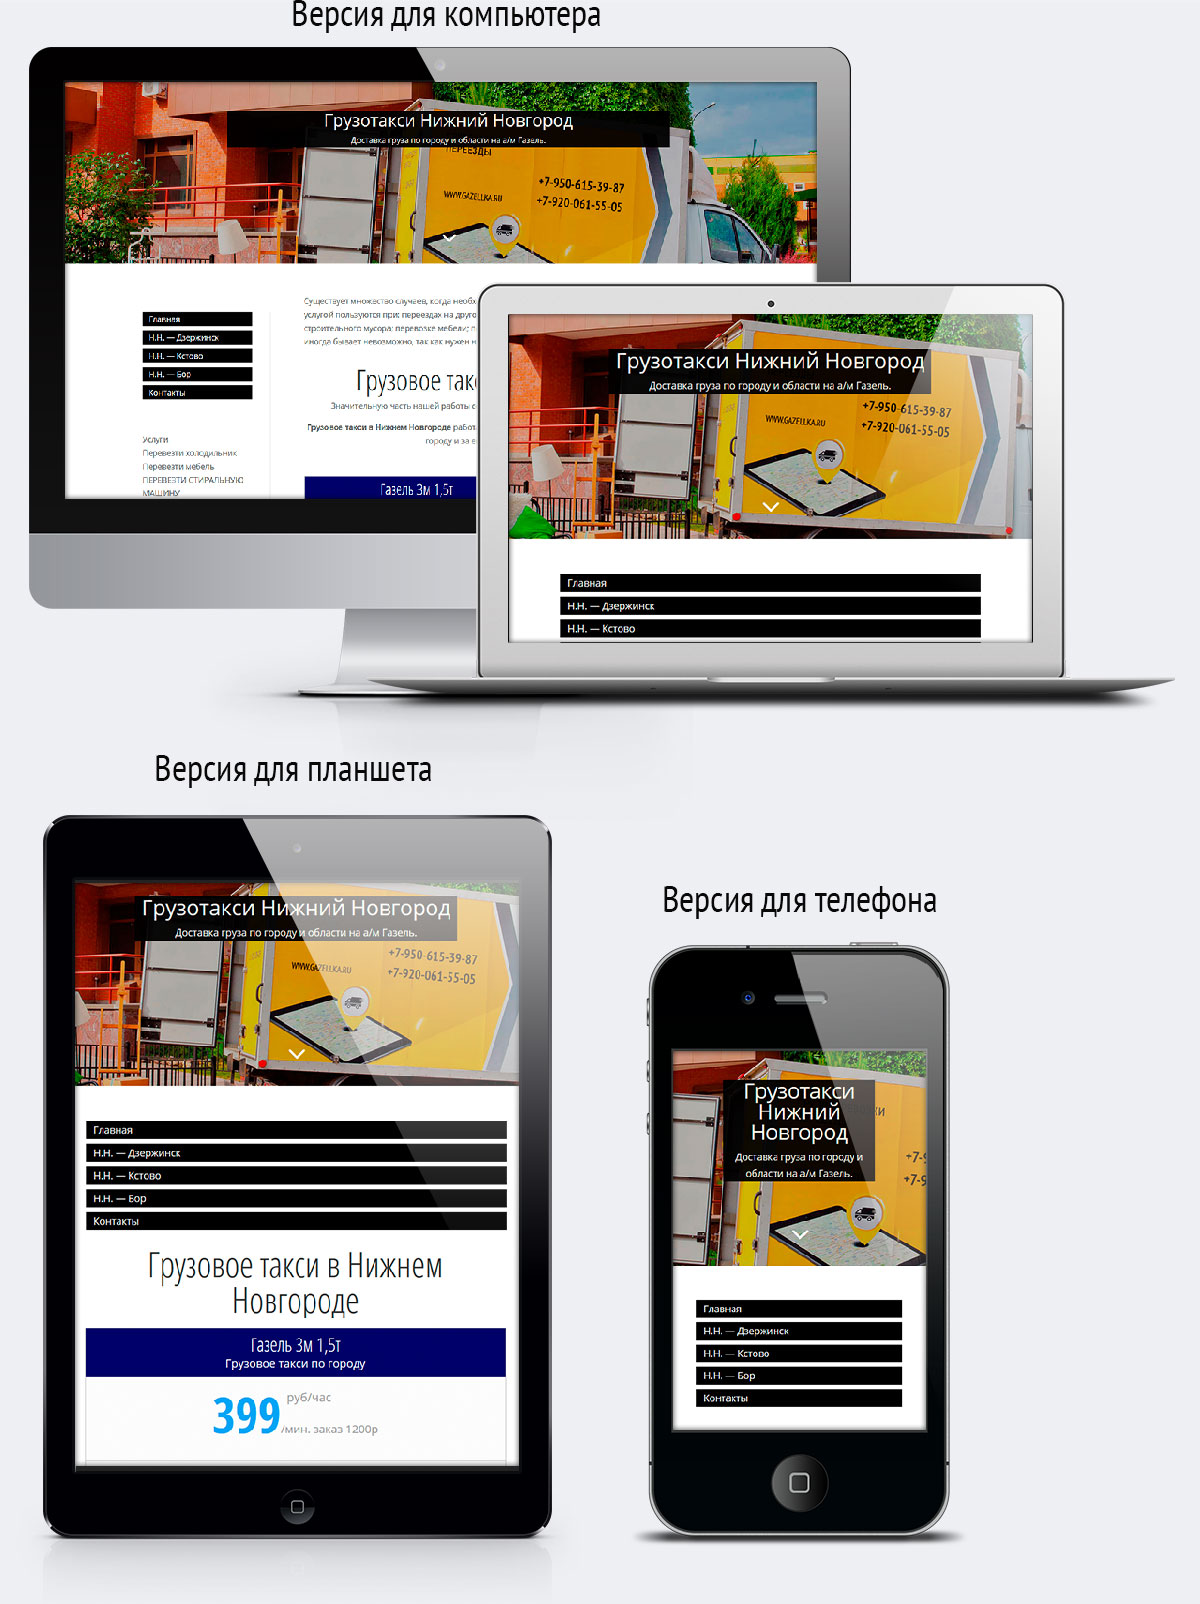 Бизнес сайт для грузотакси